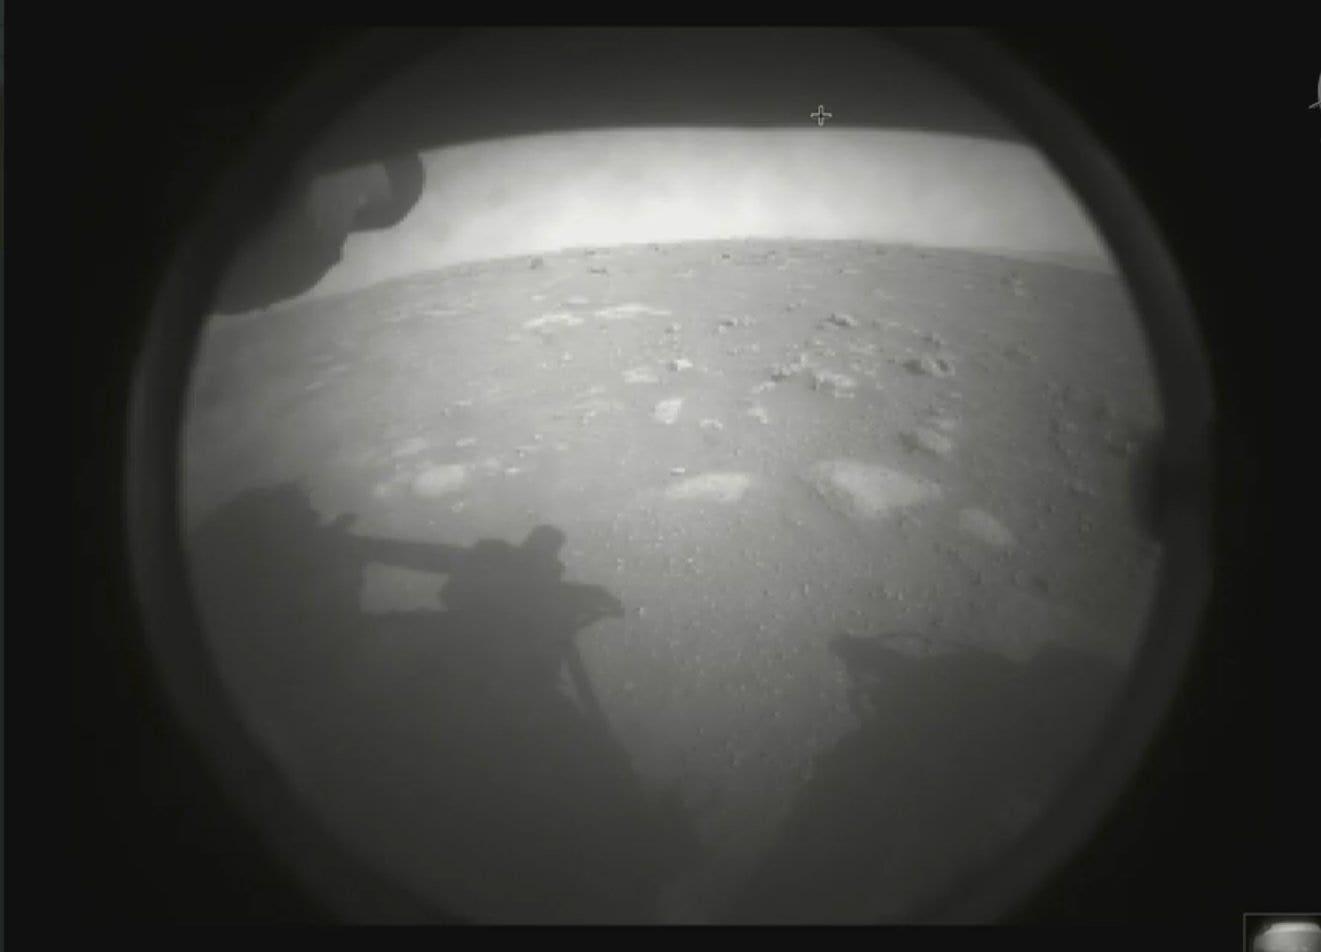 NASA's Perseverance rover lands on Mars